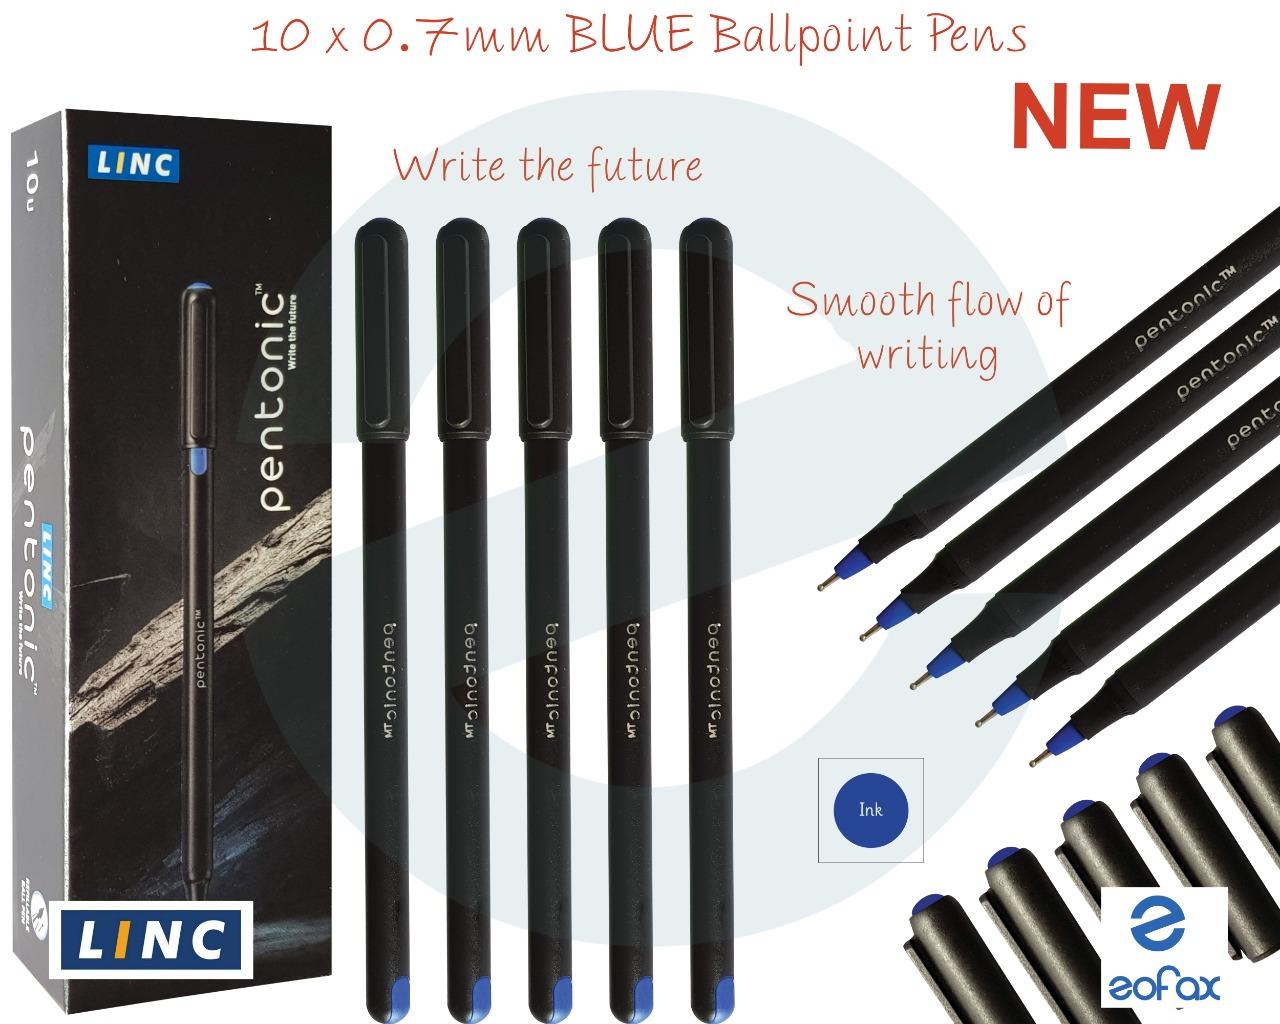 5 x 0.7mm Fine Tip LINC Meeting BLUE Ballpoint Smooth Stylish Pens Easy Grip